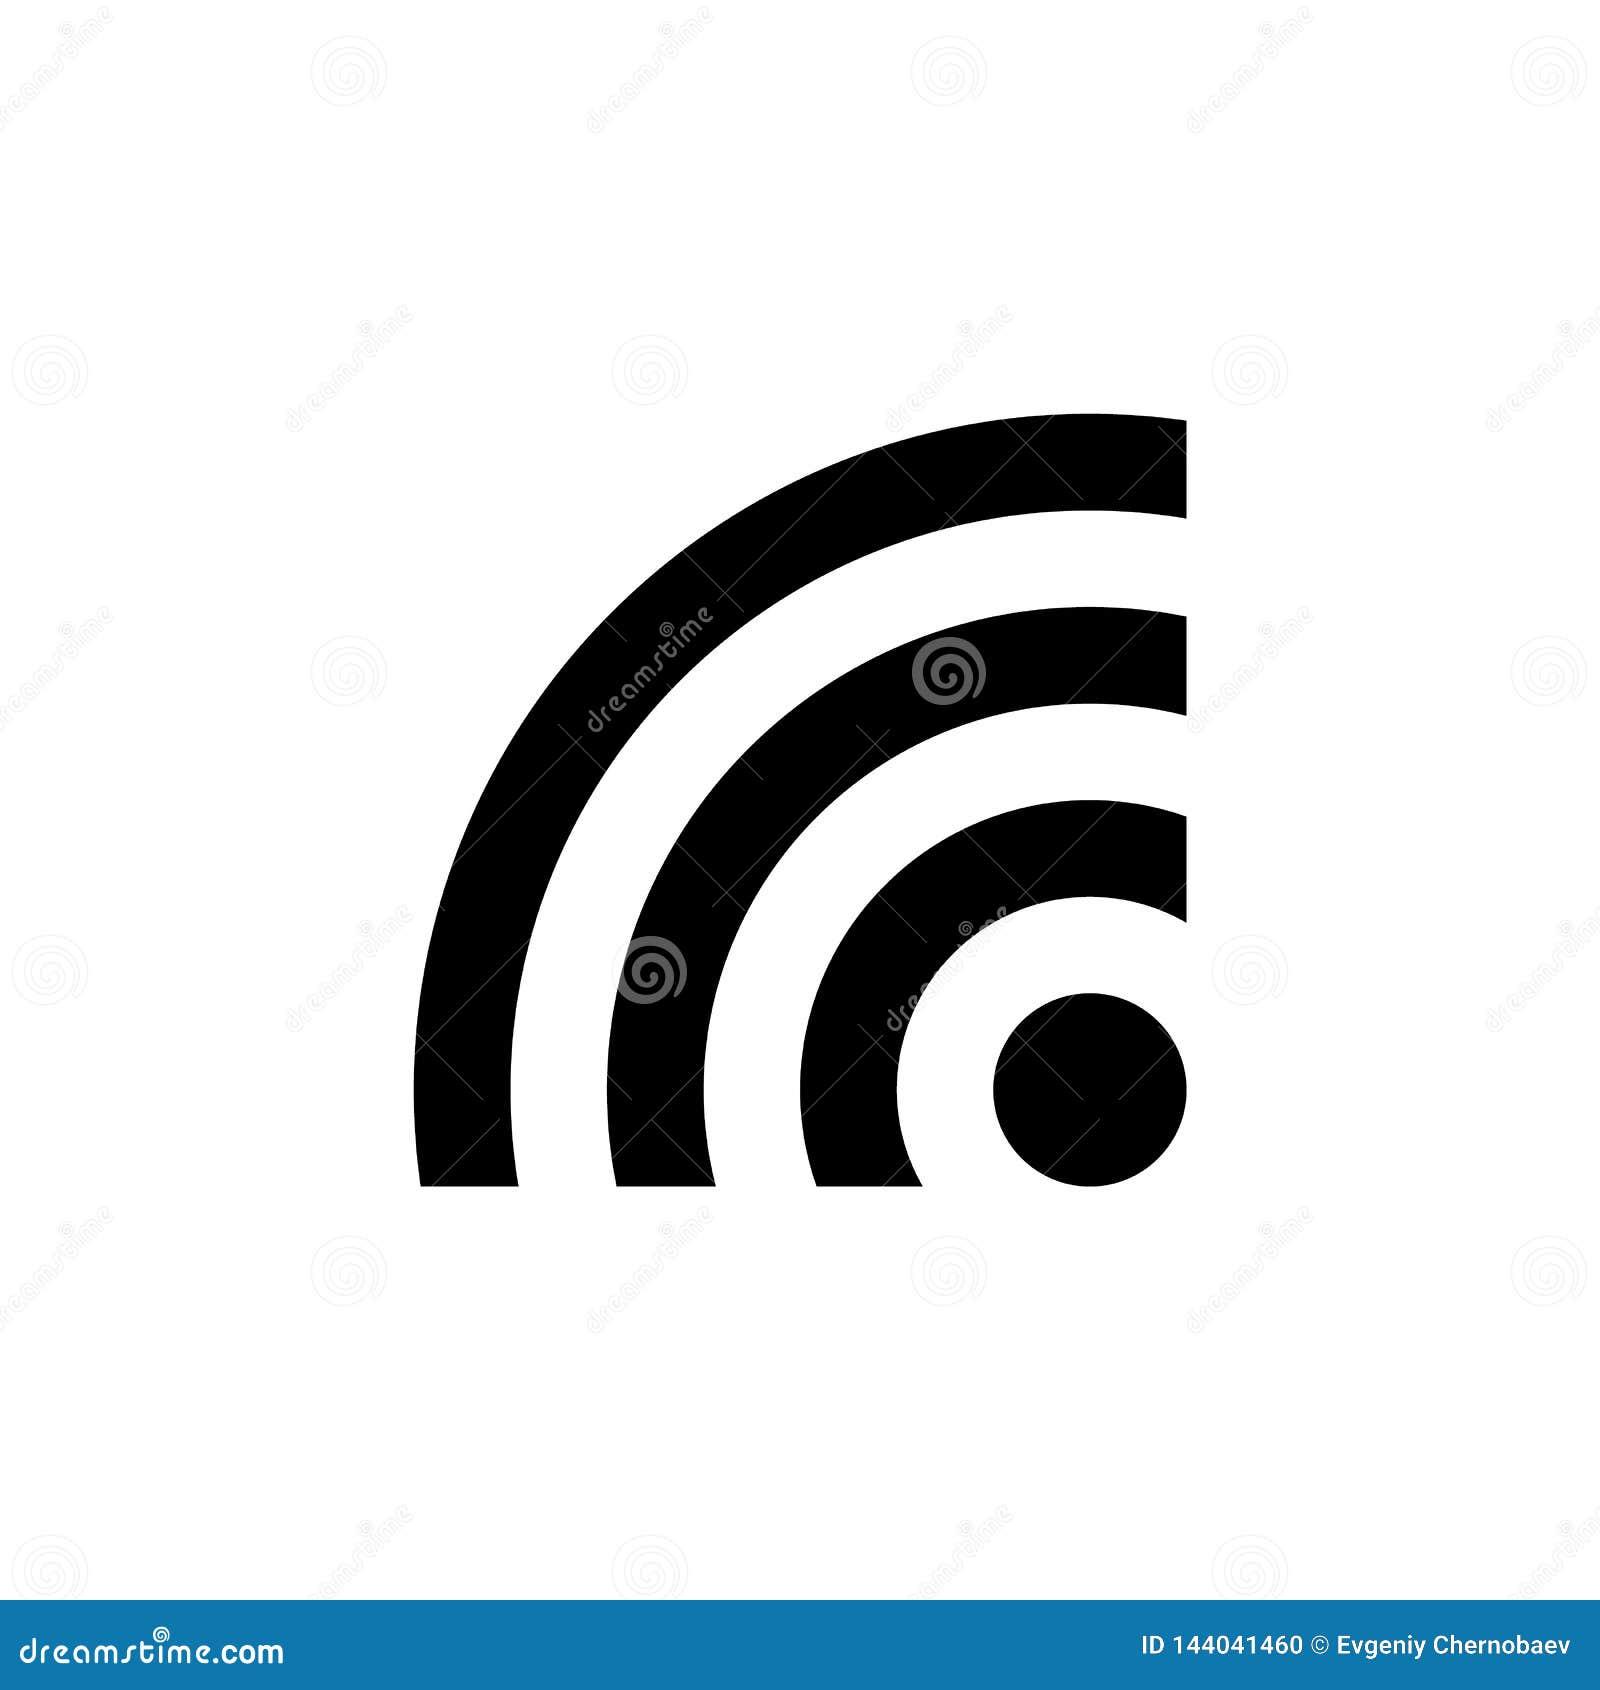 Black WI FI icon vector eps10. Wi-FI sign. WIFI icon vector, Wireless internet Sign.